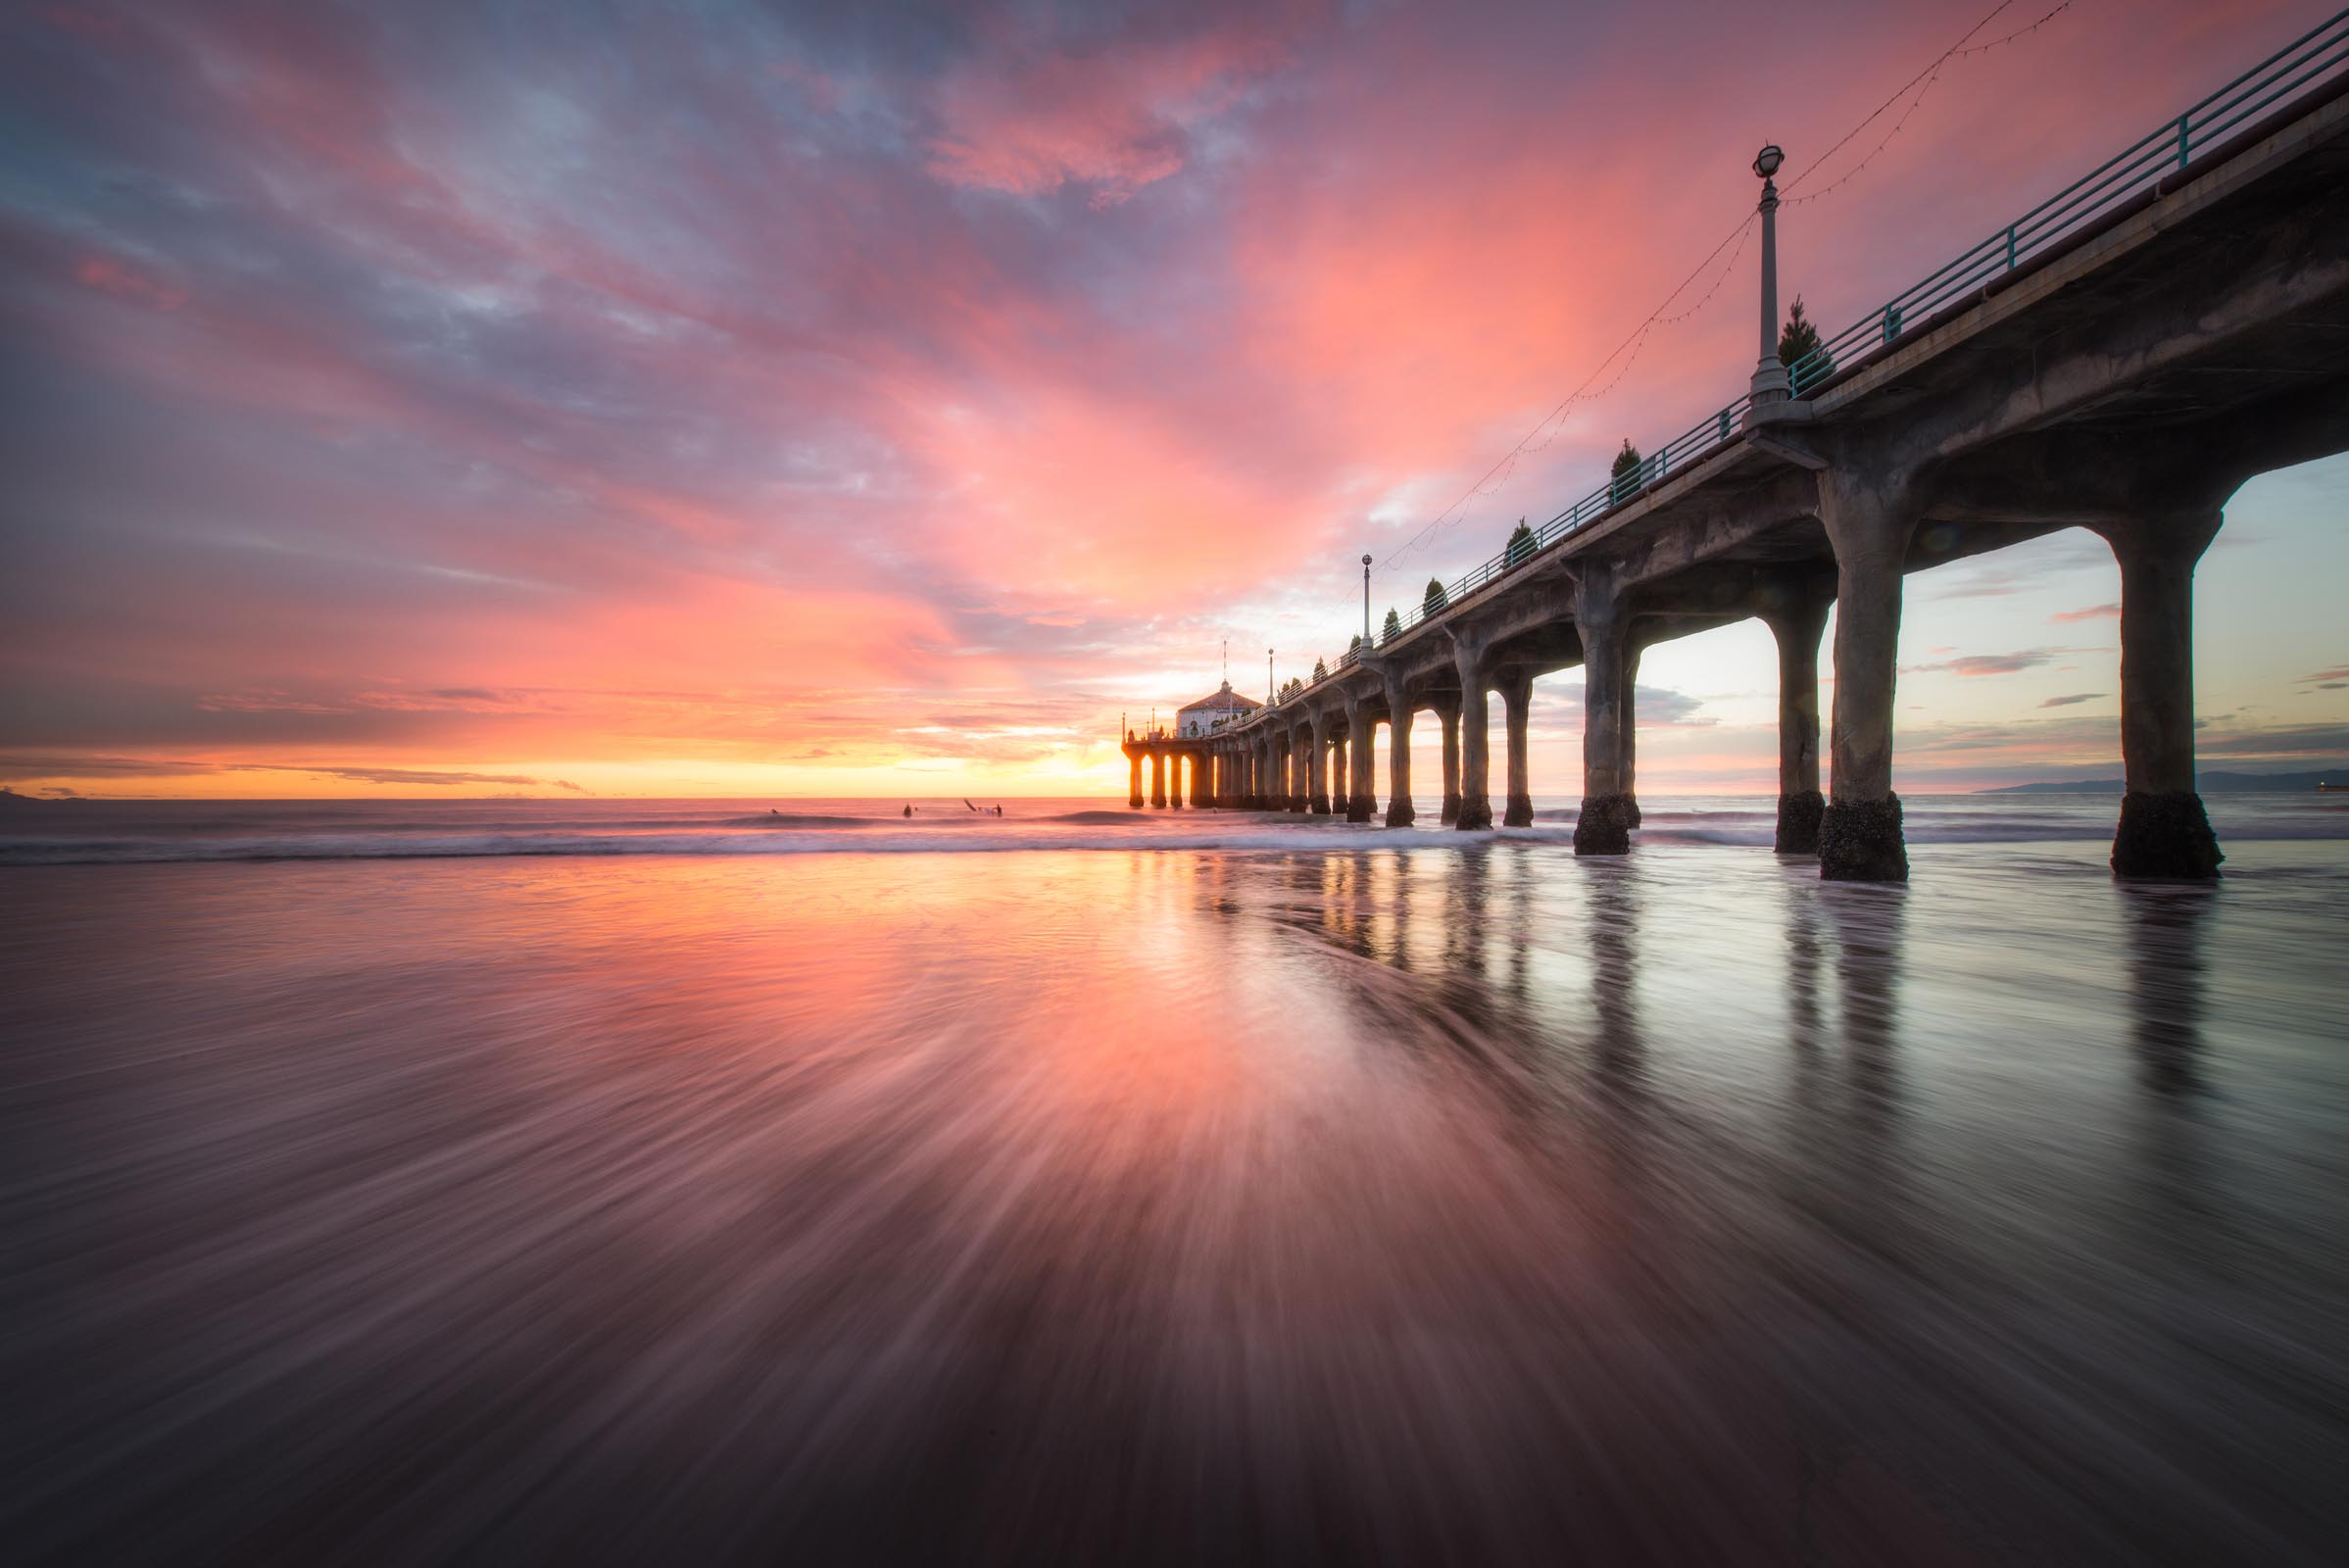 Photograph of Manhattan Beach Pier in Manhattan Beach, California by Brent Goldman Photography